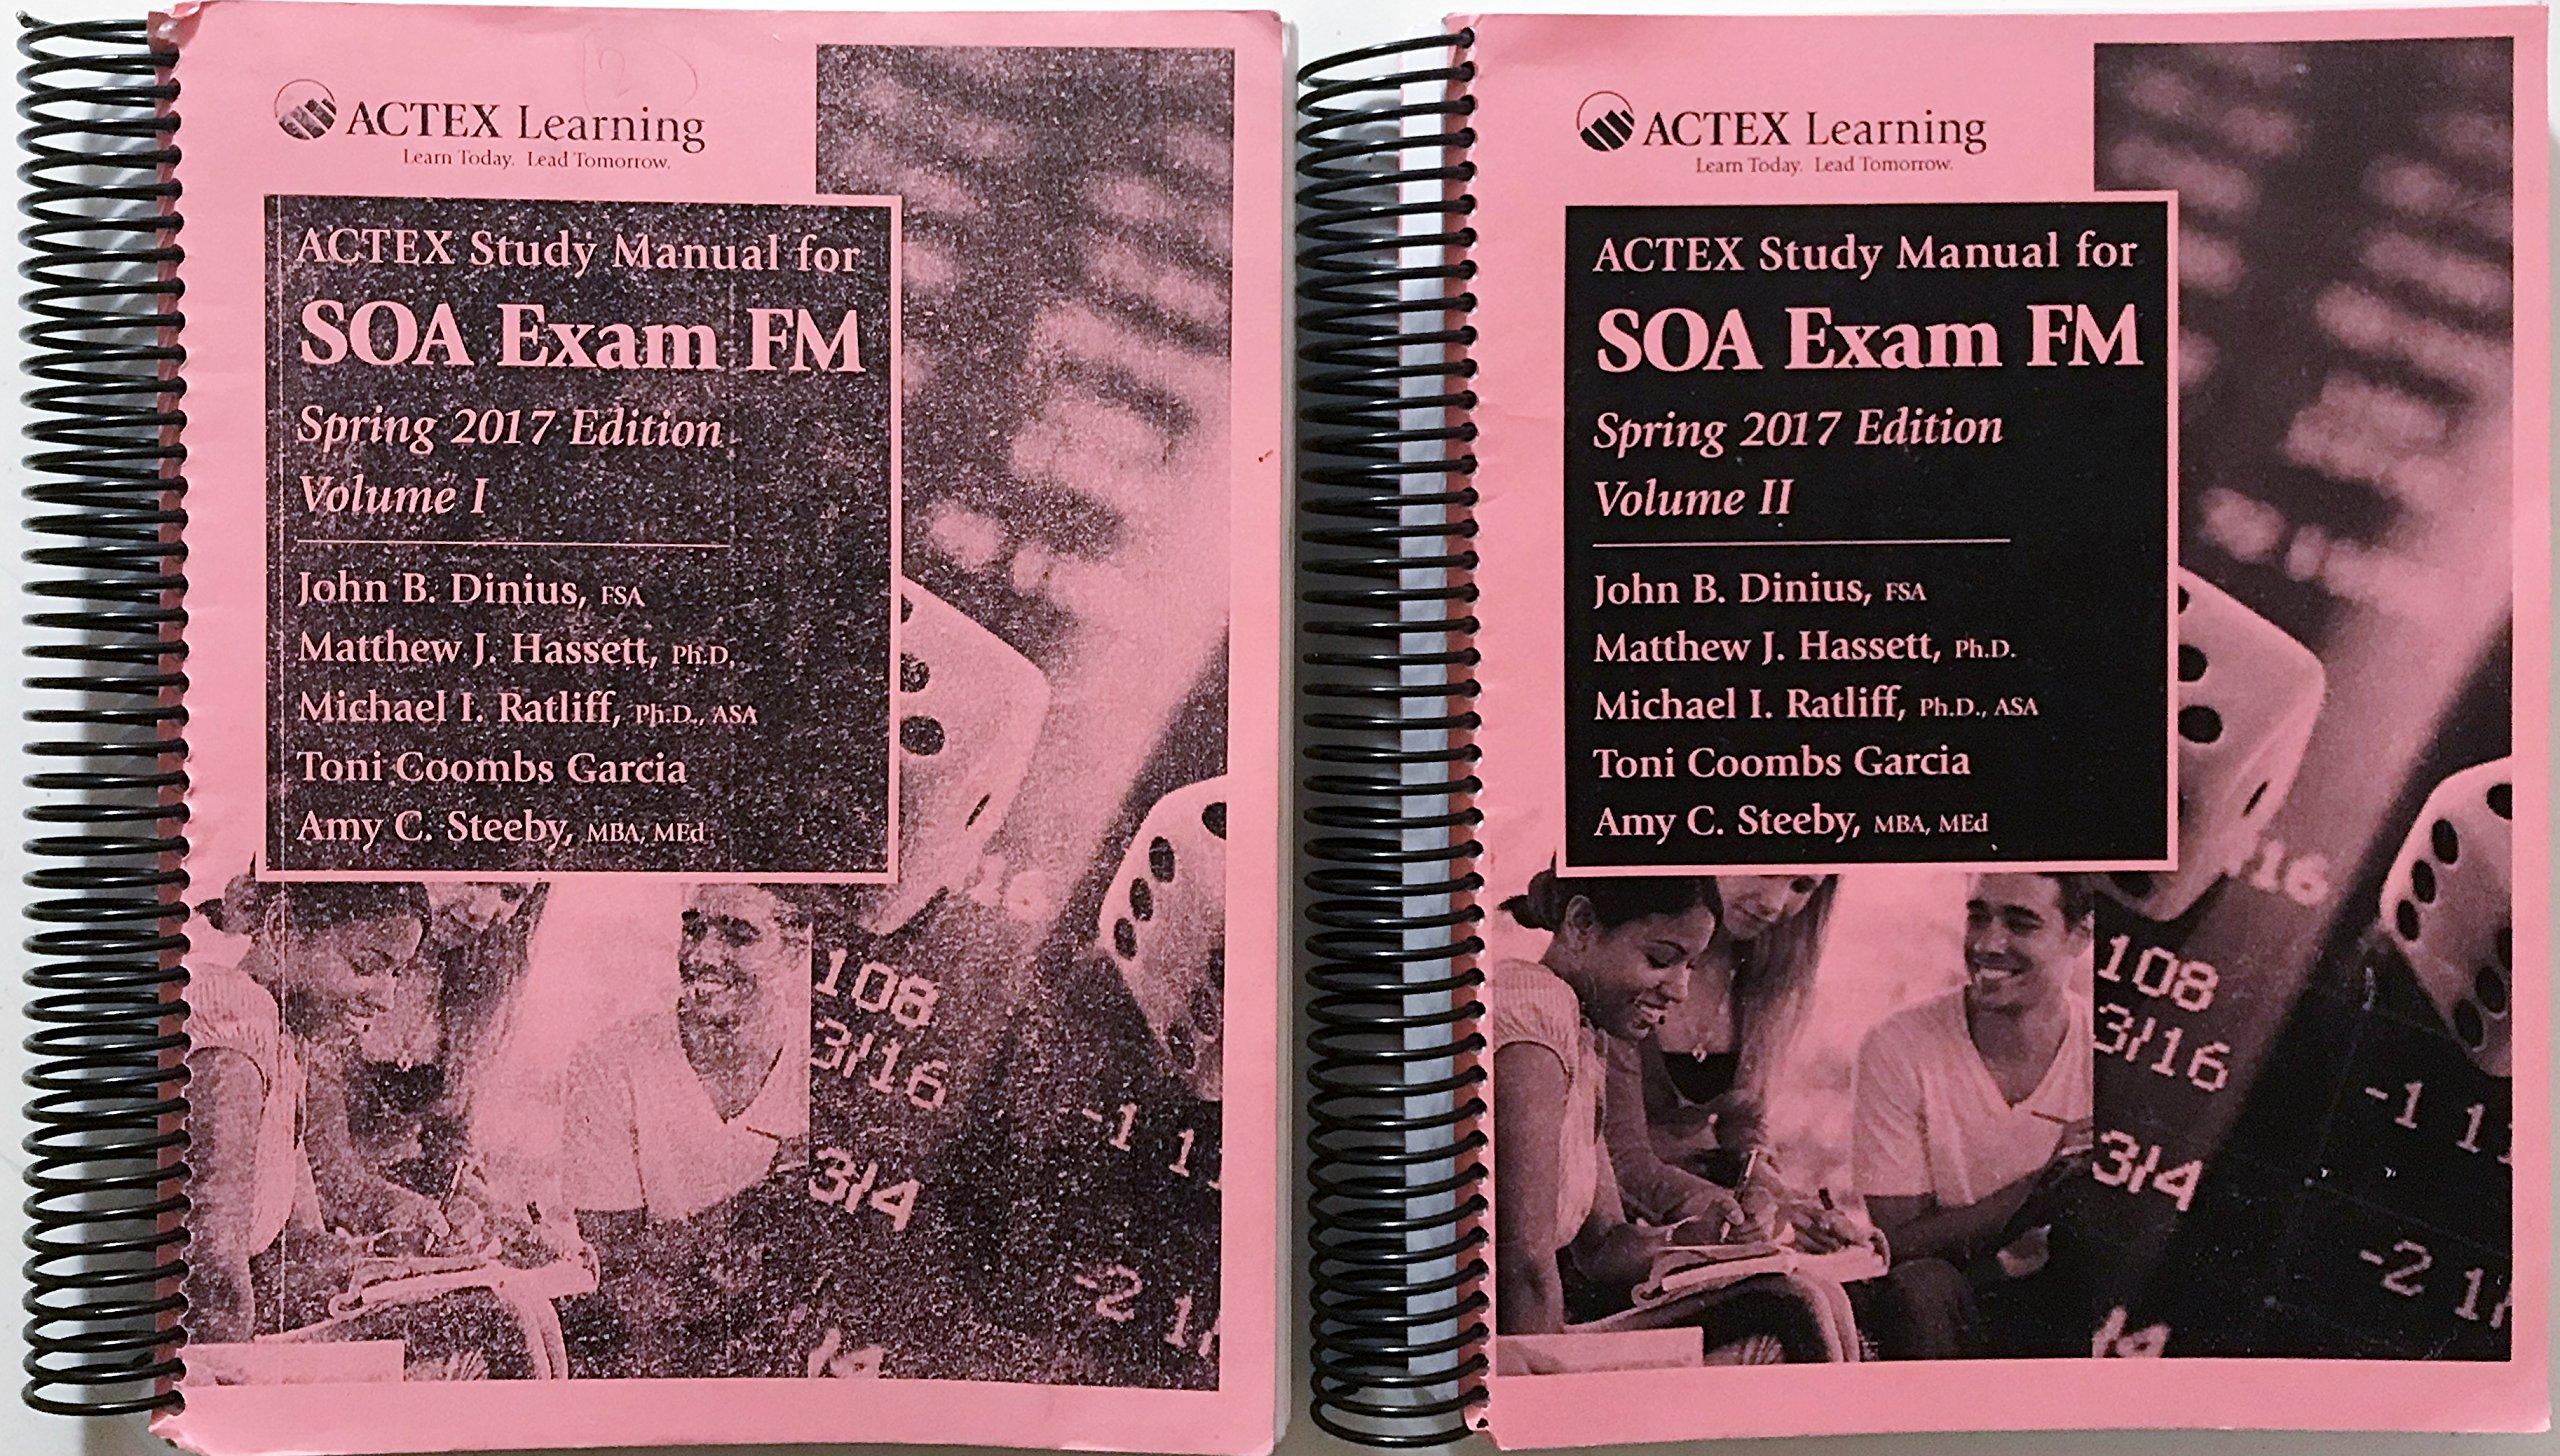 Download ACTEX Study Manual for SOA Exam FM 2017 Two Volumes PDF